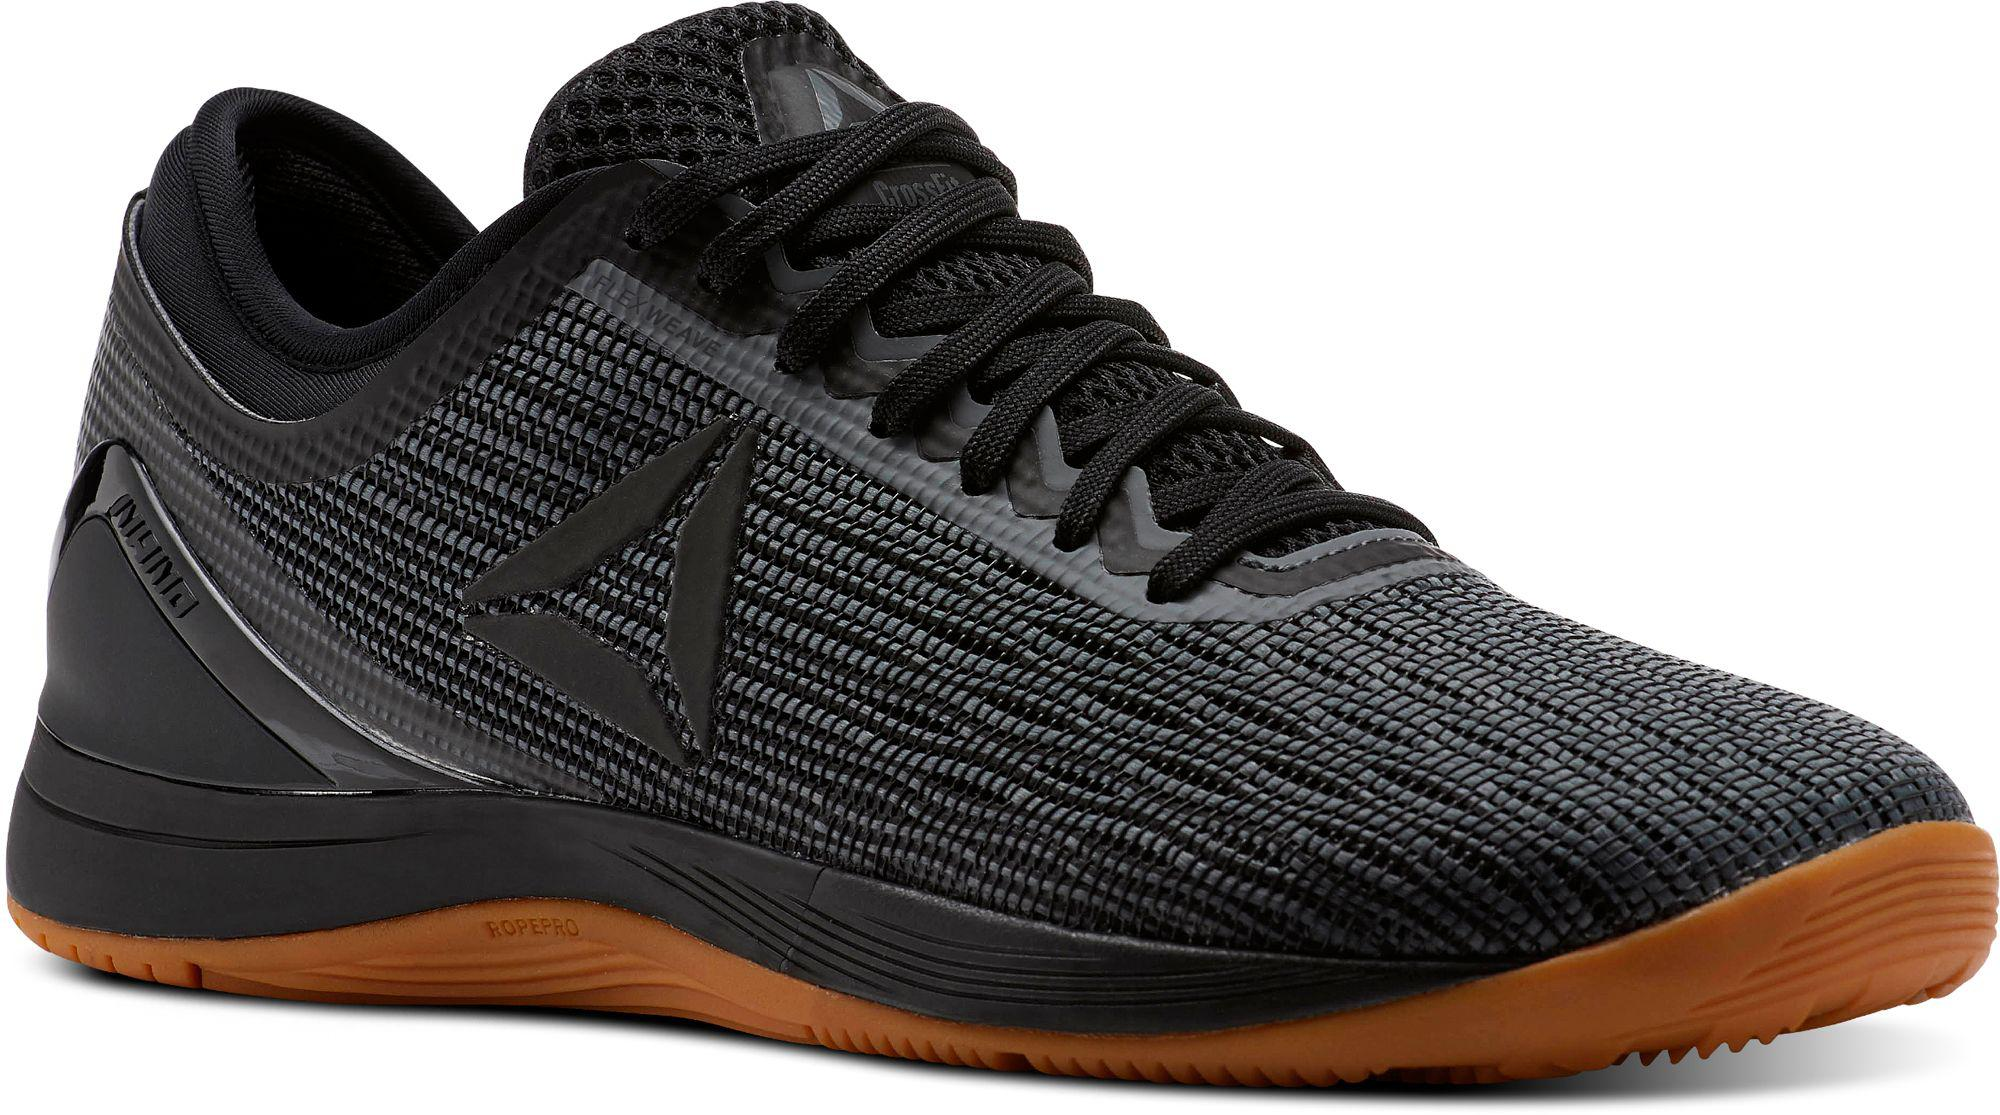 9a6cd7572cf213 Lyst - Reebok Crossfit Nano 8 Flexweave Shoes in Black